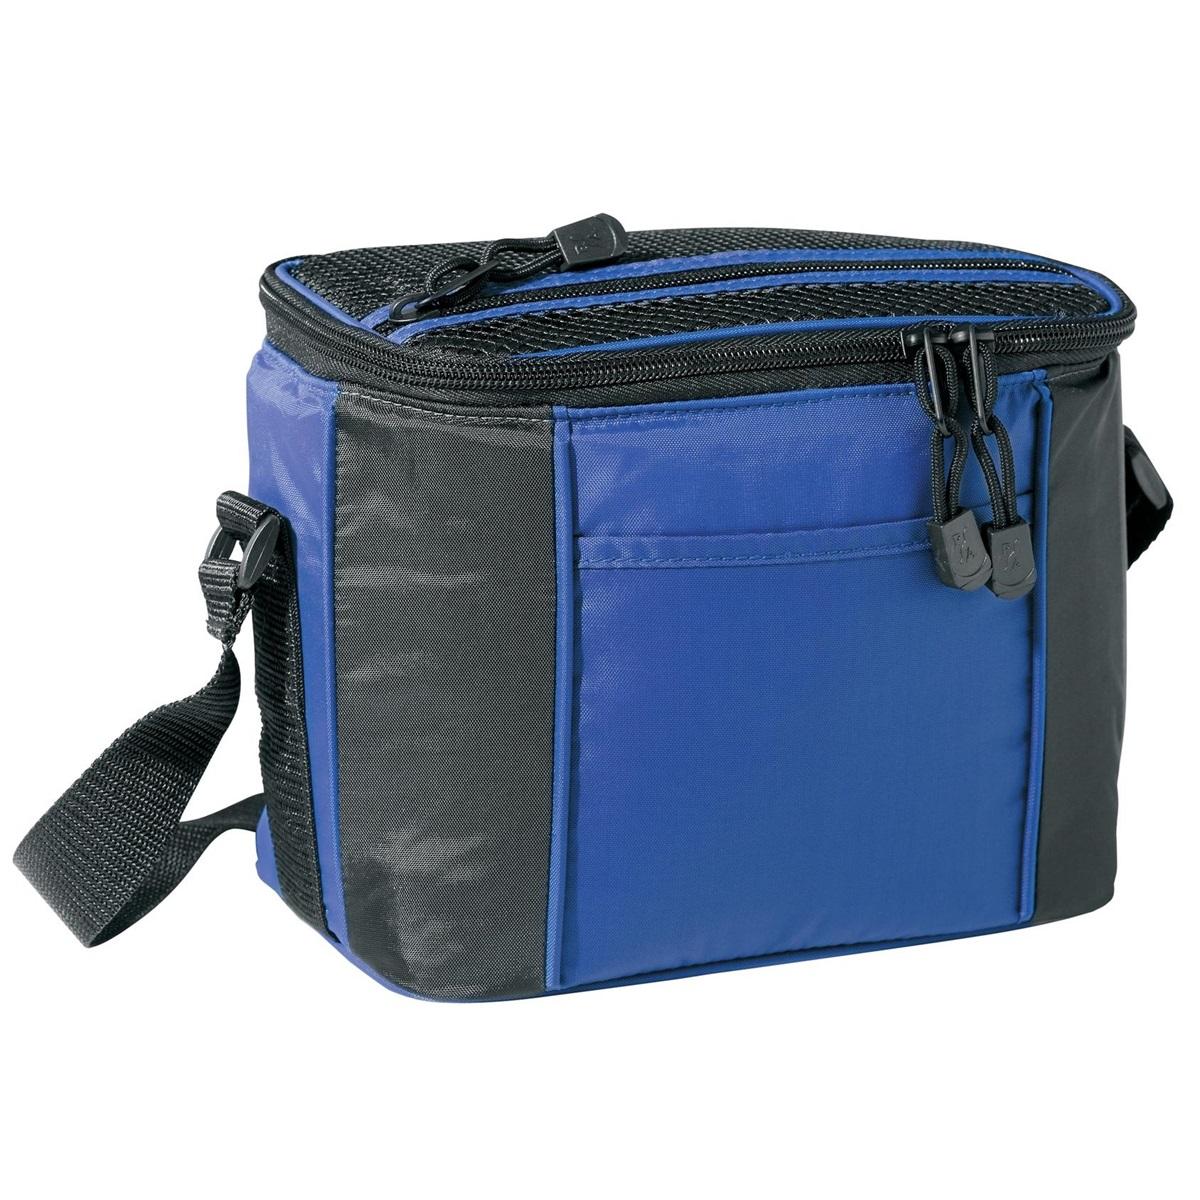 6 Pack Cooler ~ Port company bg pack cooler royal fullsource